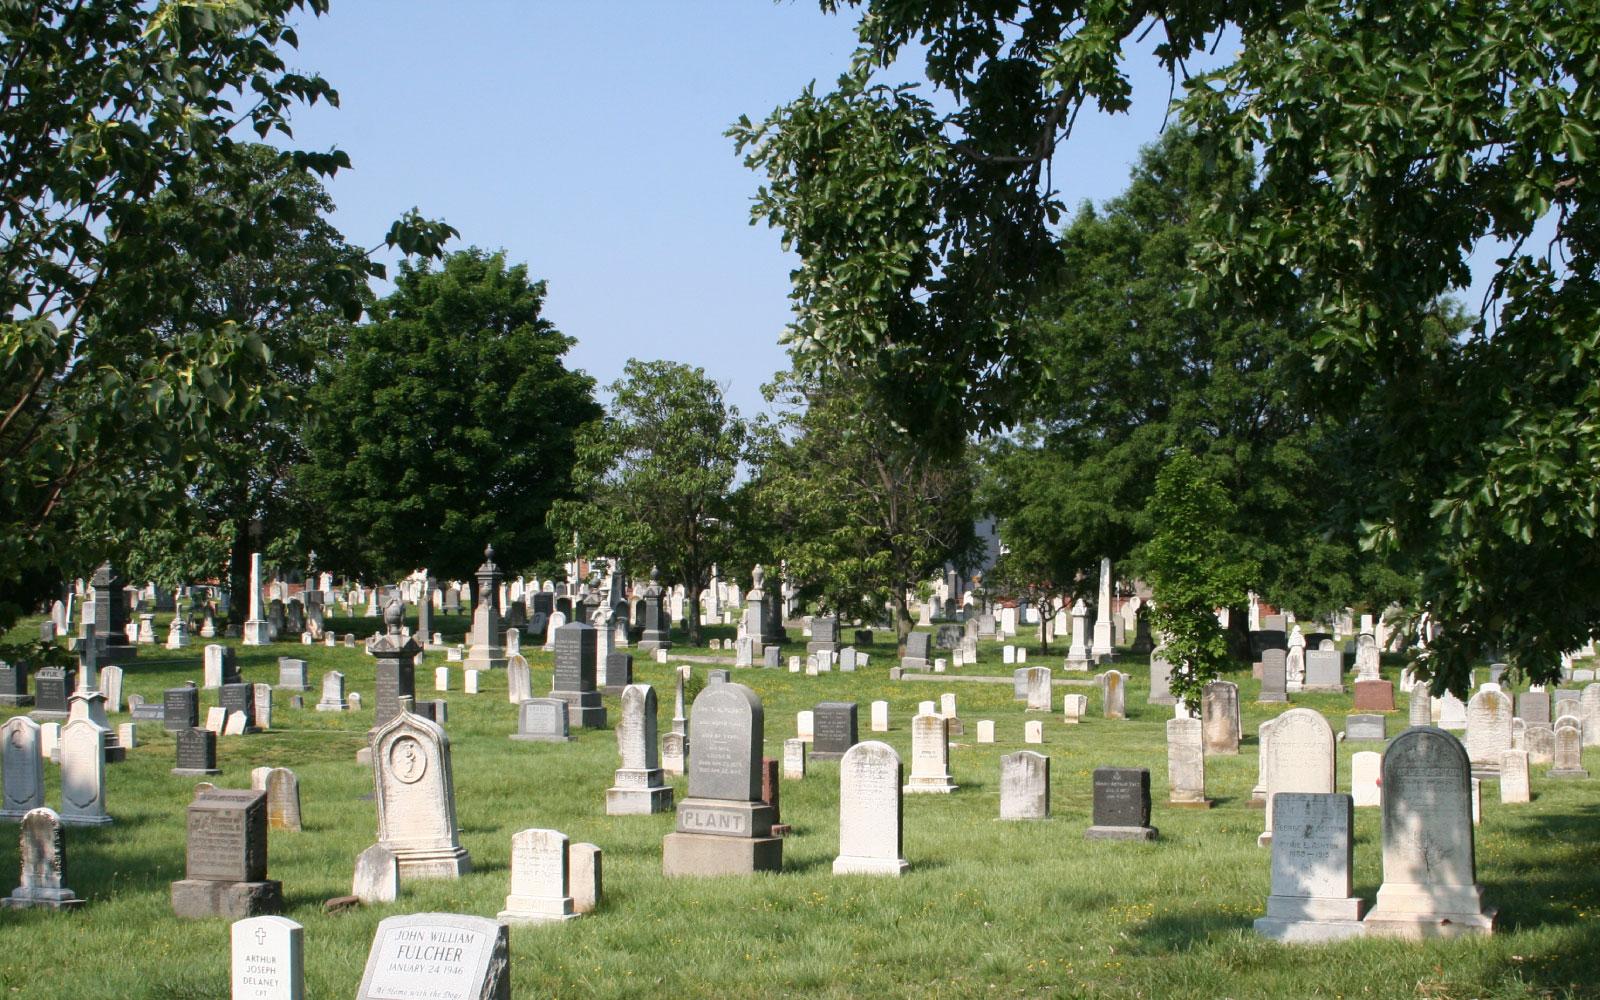 home-page-slide-1-weidner-memorials